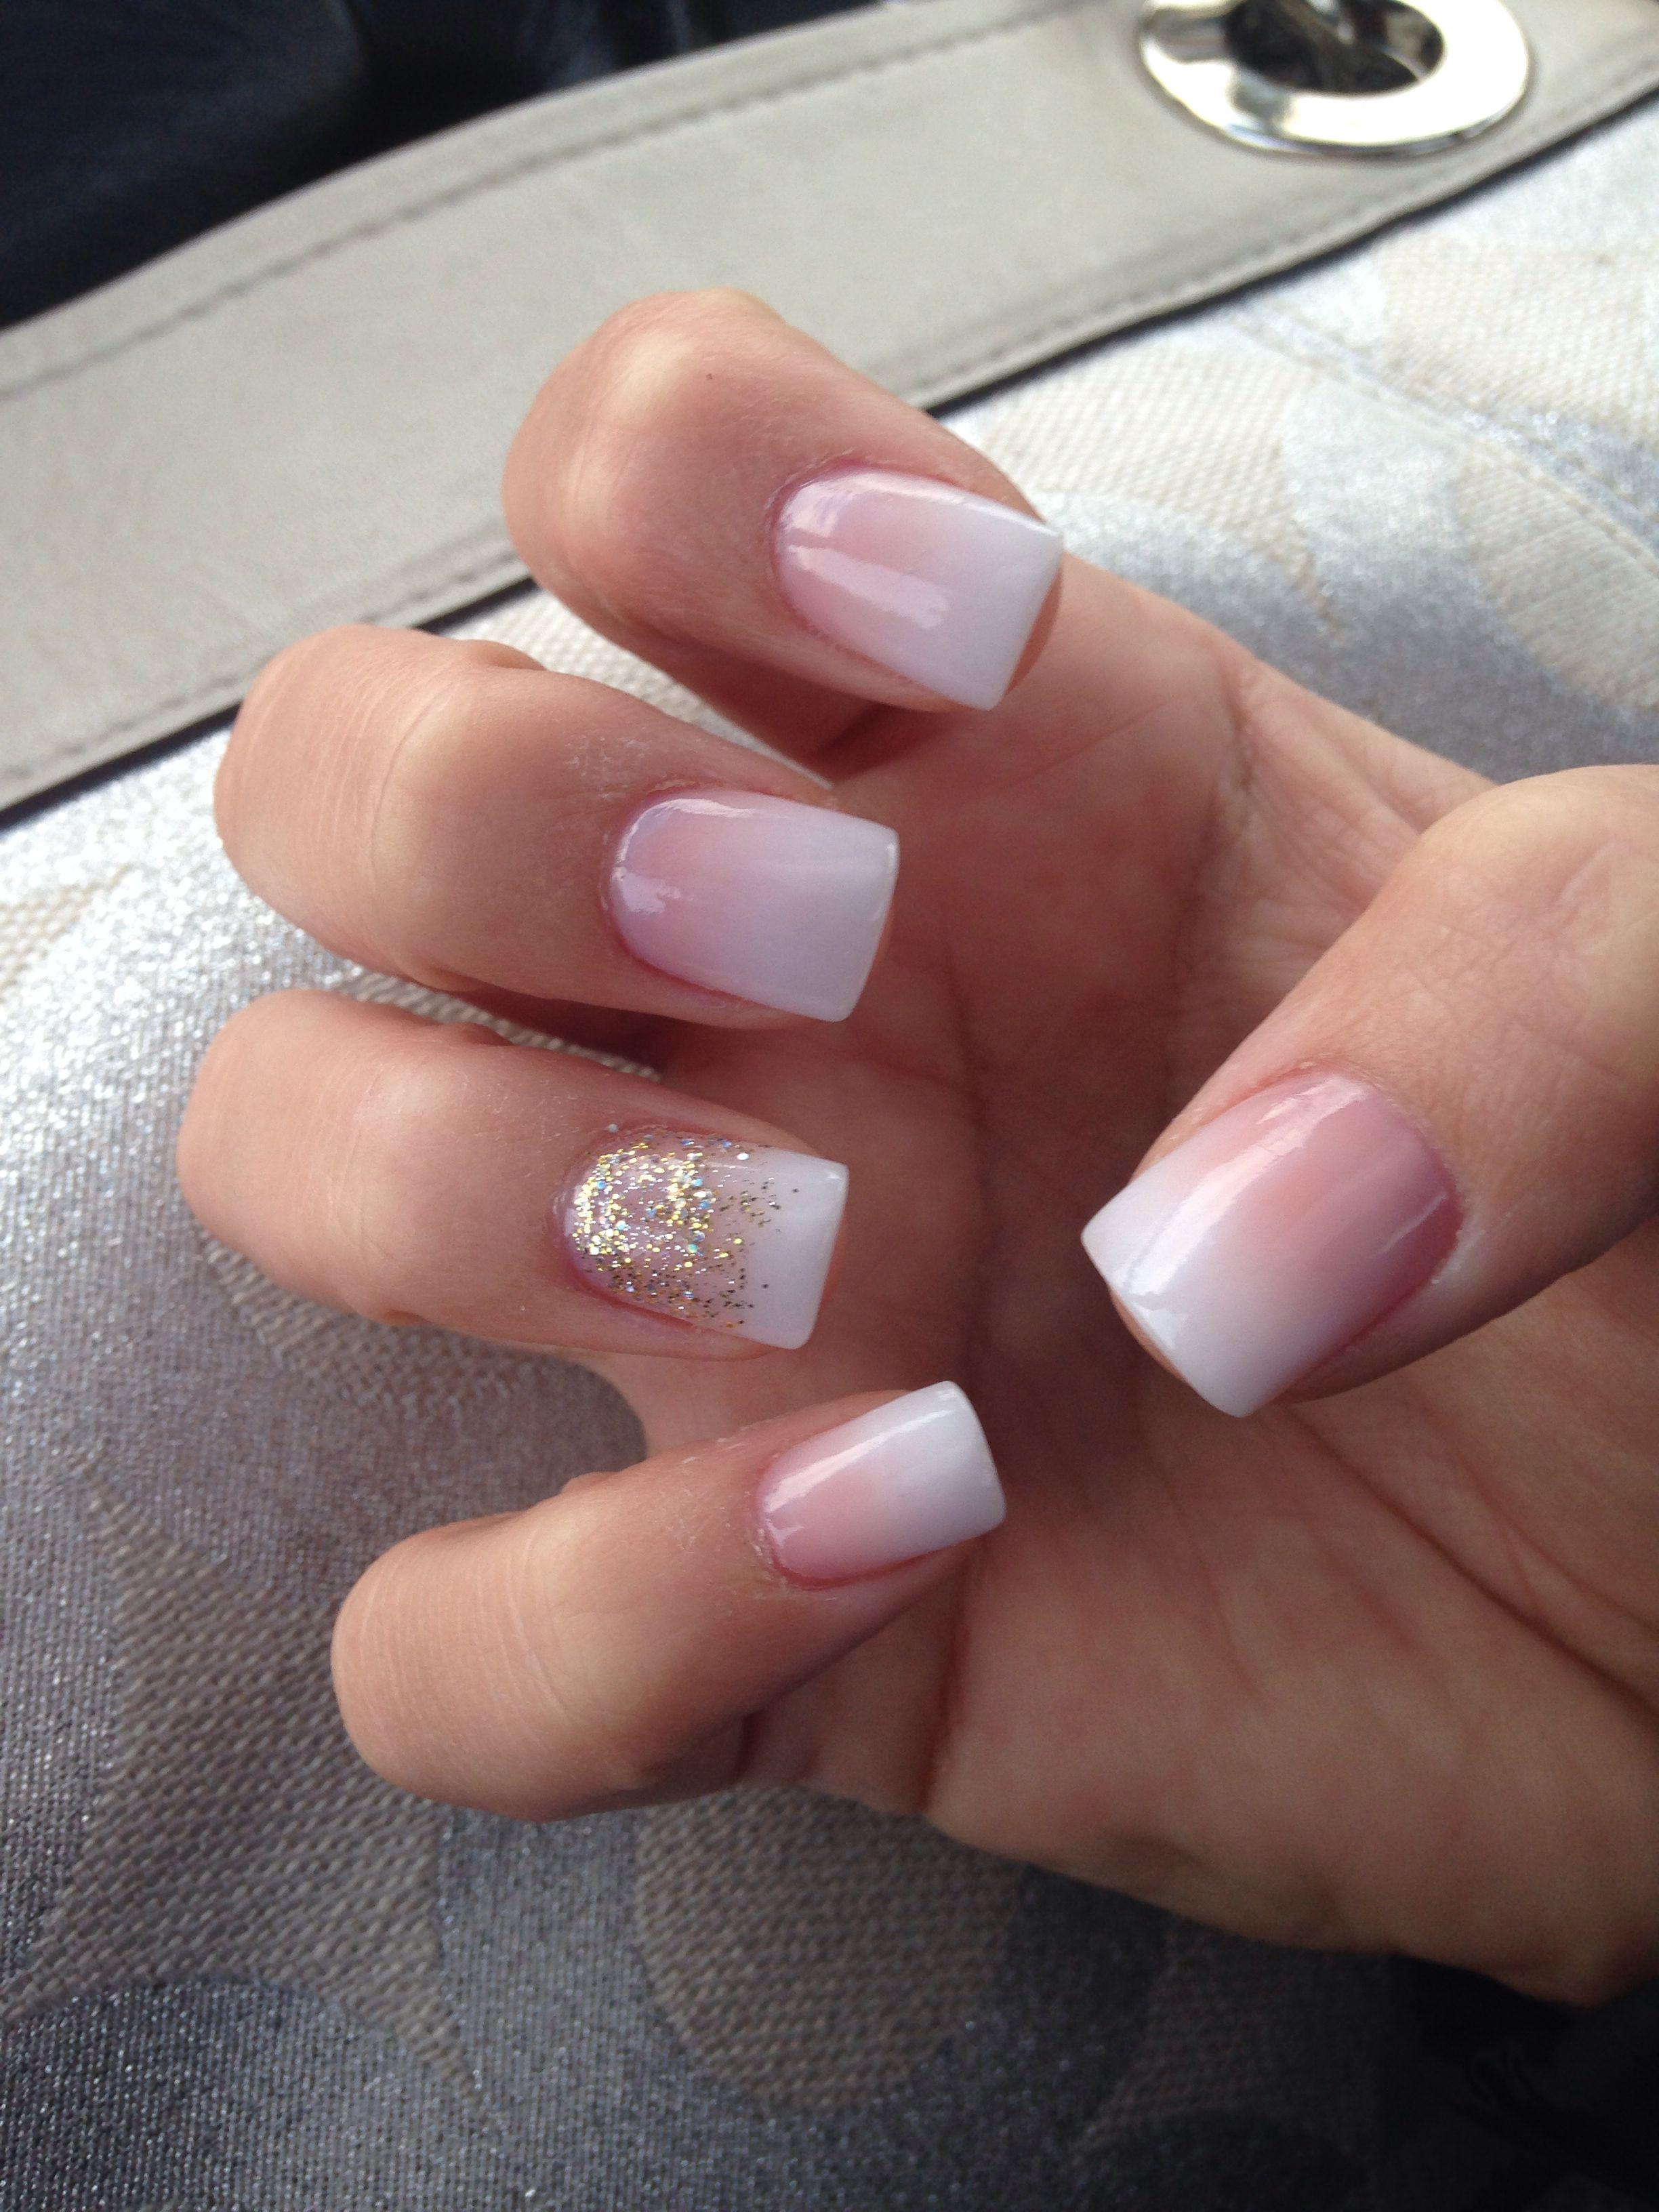 Beautifully subtle | Pretty nails, Gel nails, Acrylic nails